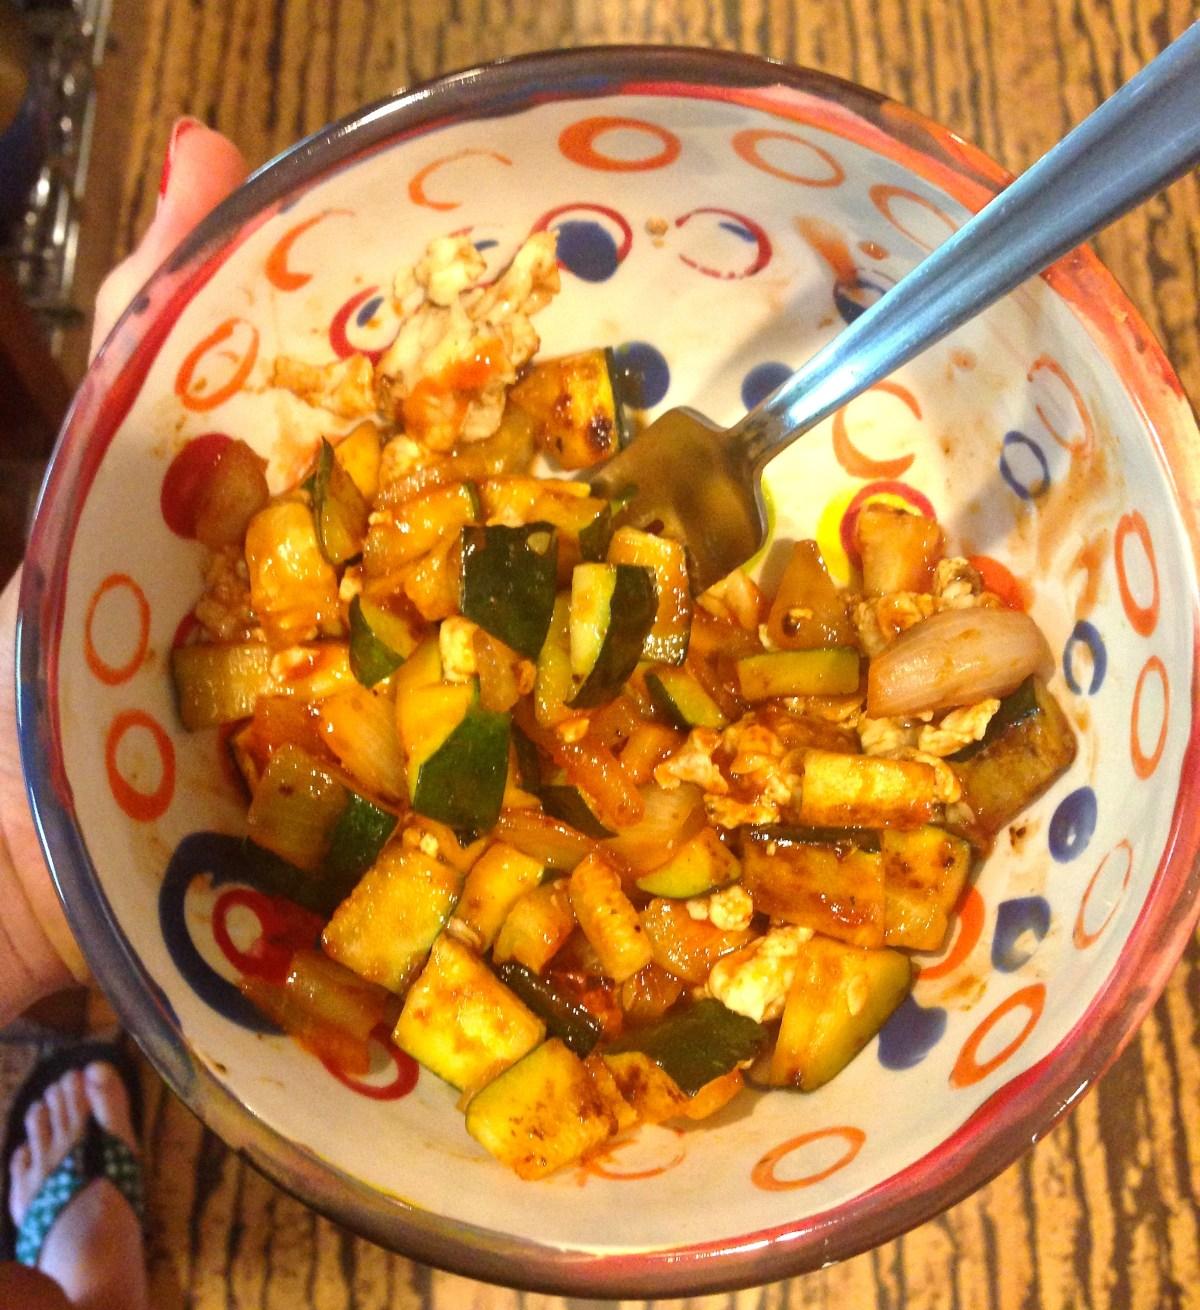 spicy vegetable egg scramble